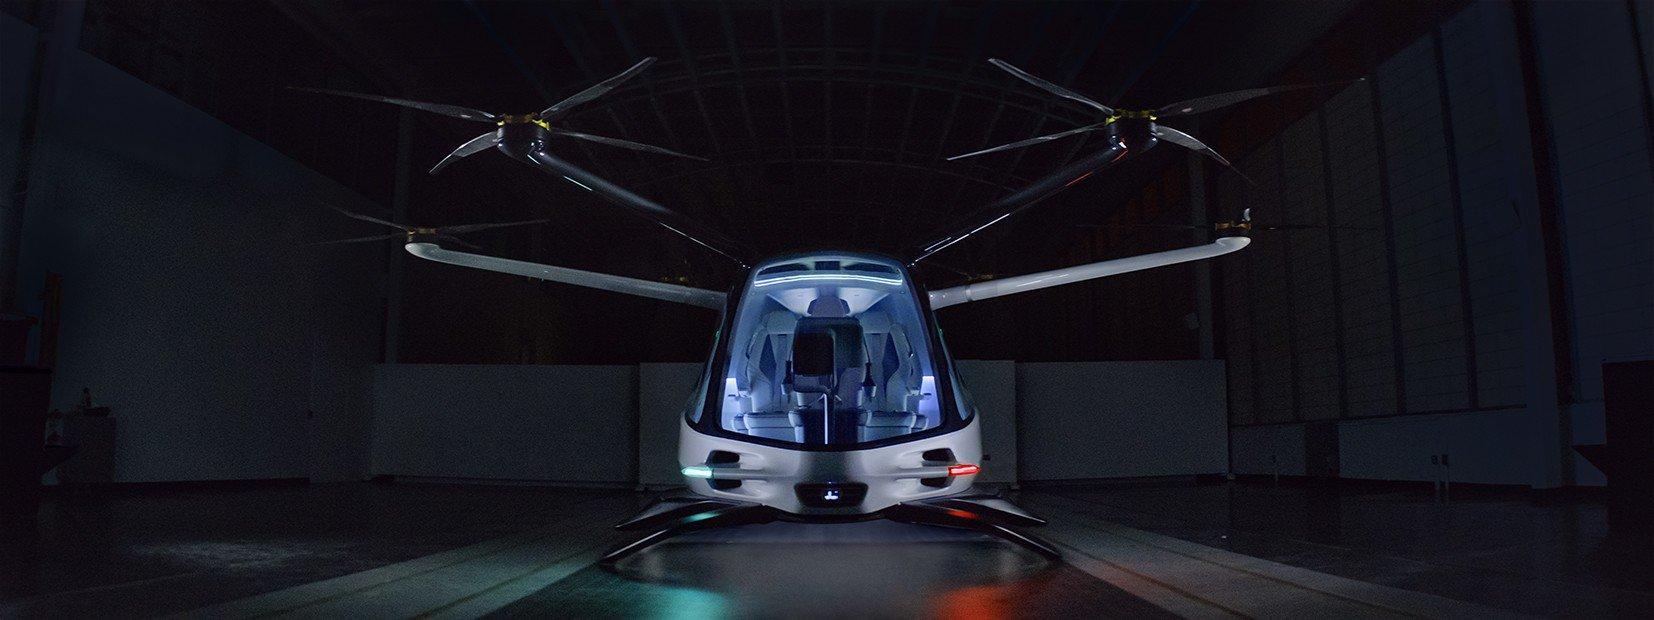 Alakai-Technologies-Skai-flying-car-1